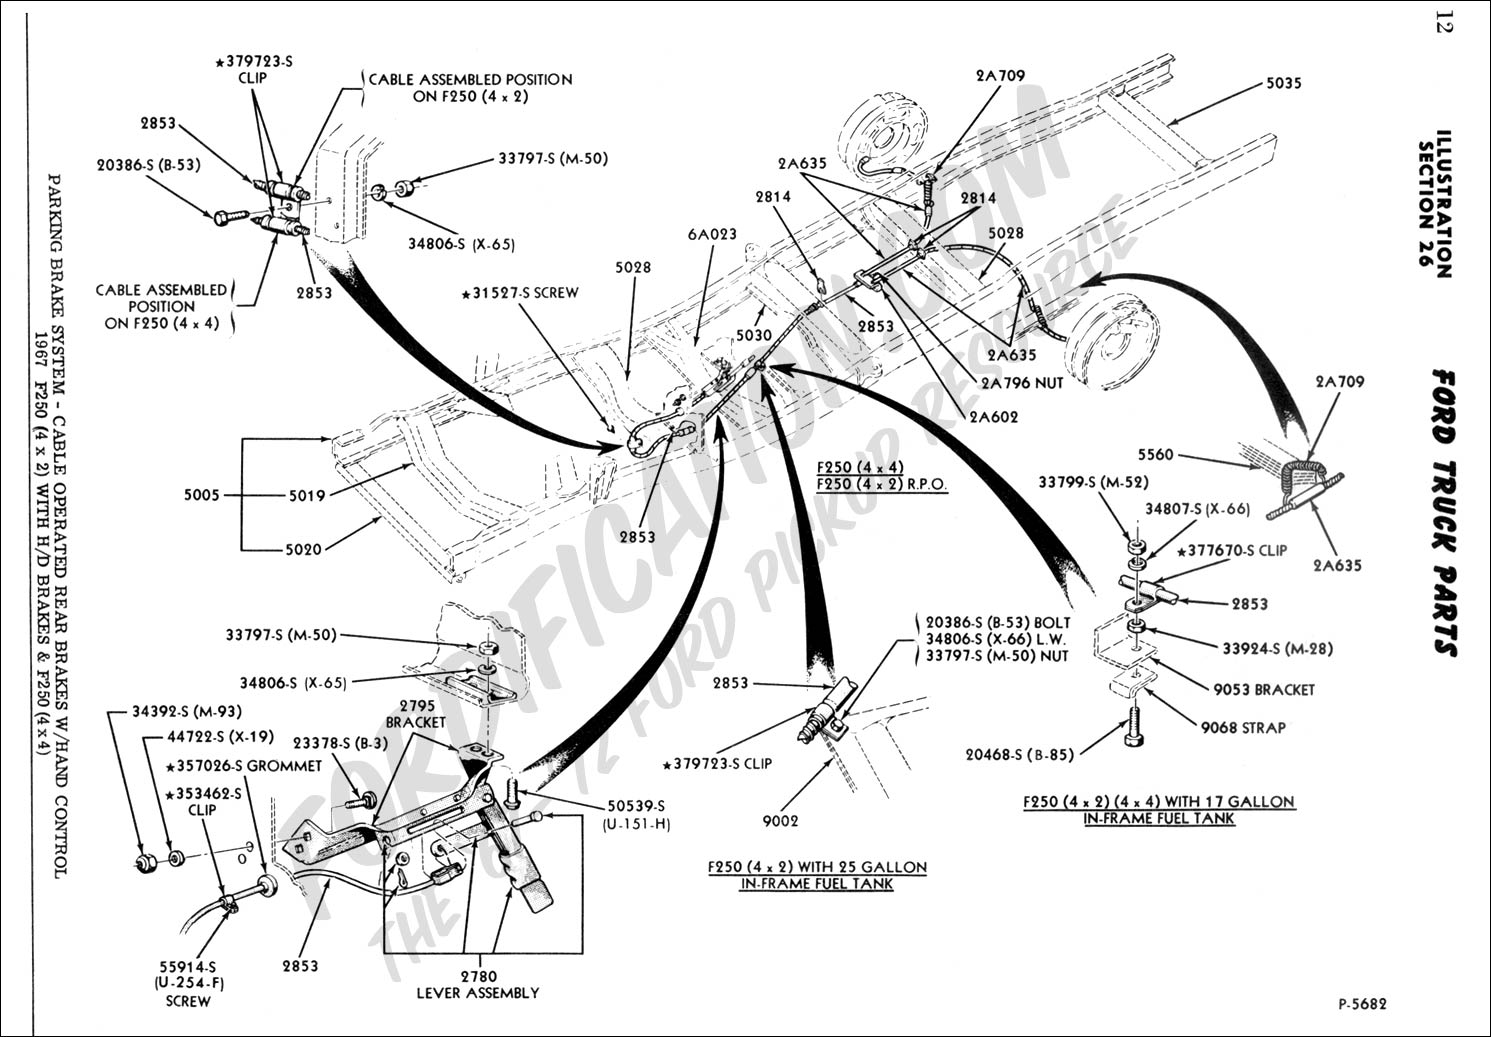 hight resolution of 02 explorer emergency brake diagram wiring diagram and 98 ford explorer brake line diagram 1997 ford explorer brake diagram